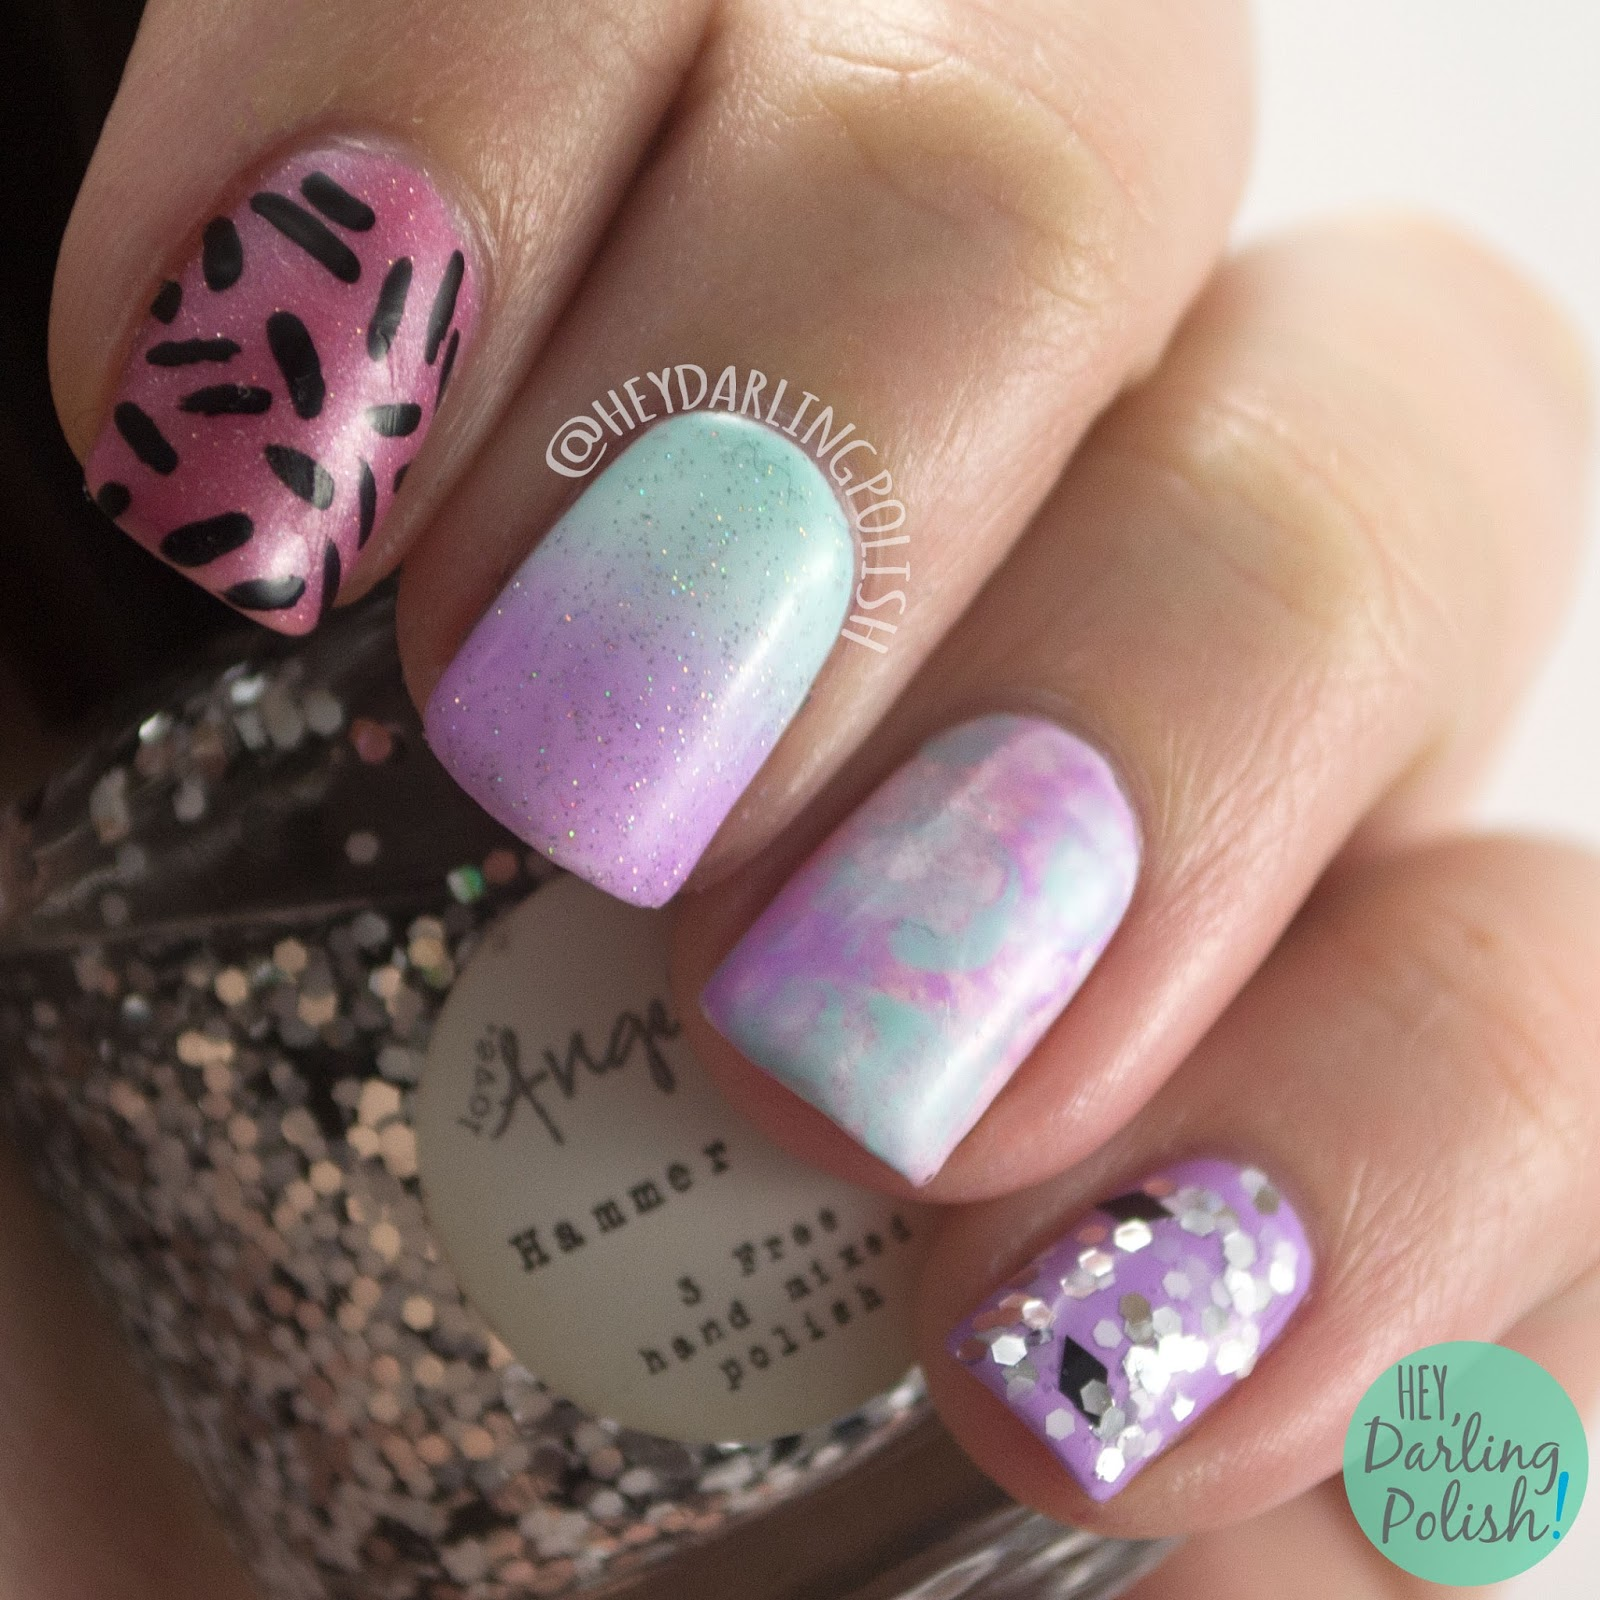 nails, nail art, nail polish, indie polish, pink, blue, purple, gradient, pattern, glitter, skittles, hey darling polish, lacquer legion, llreflection